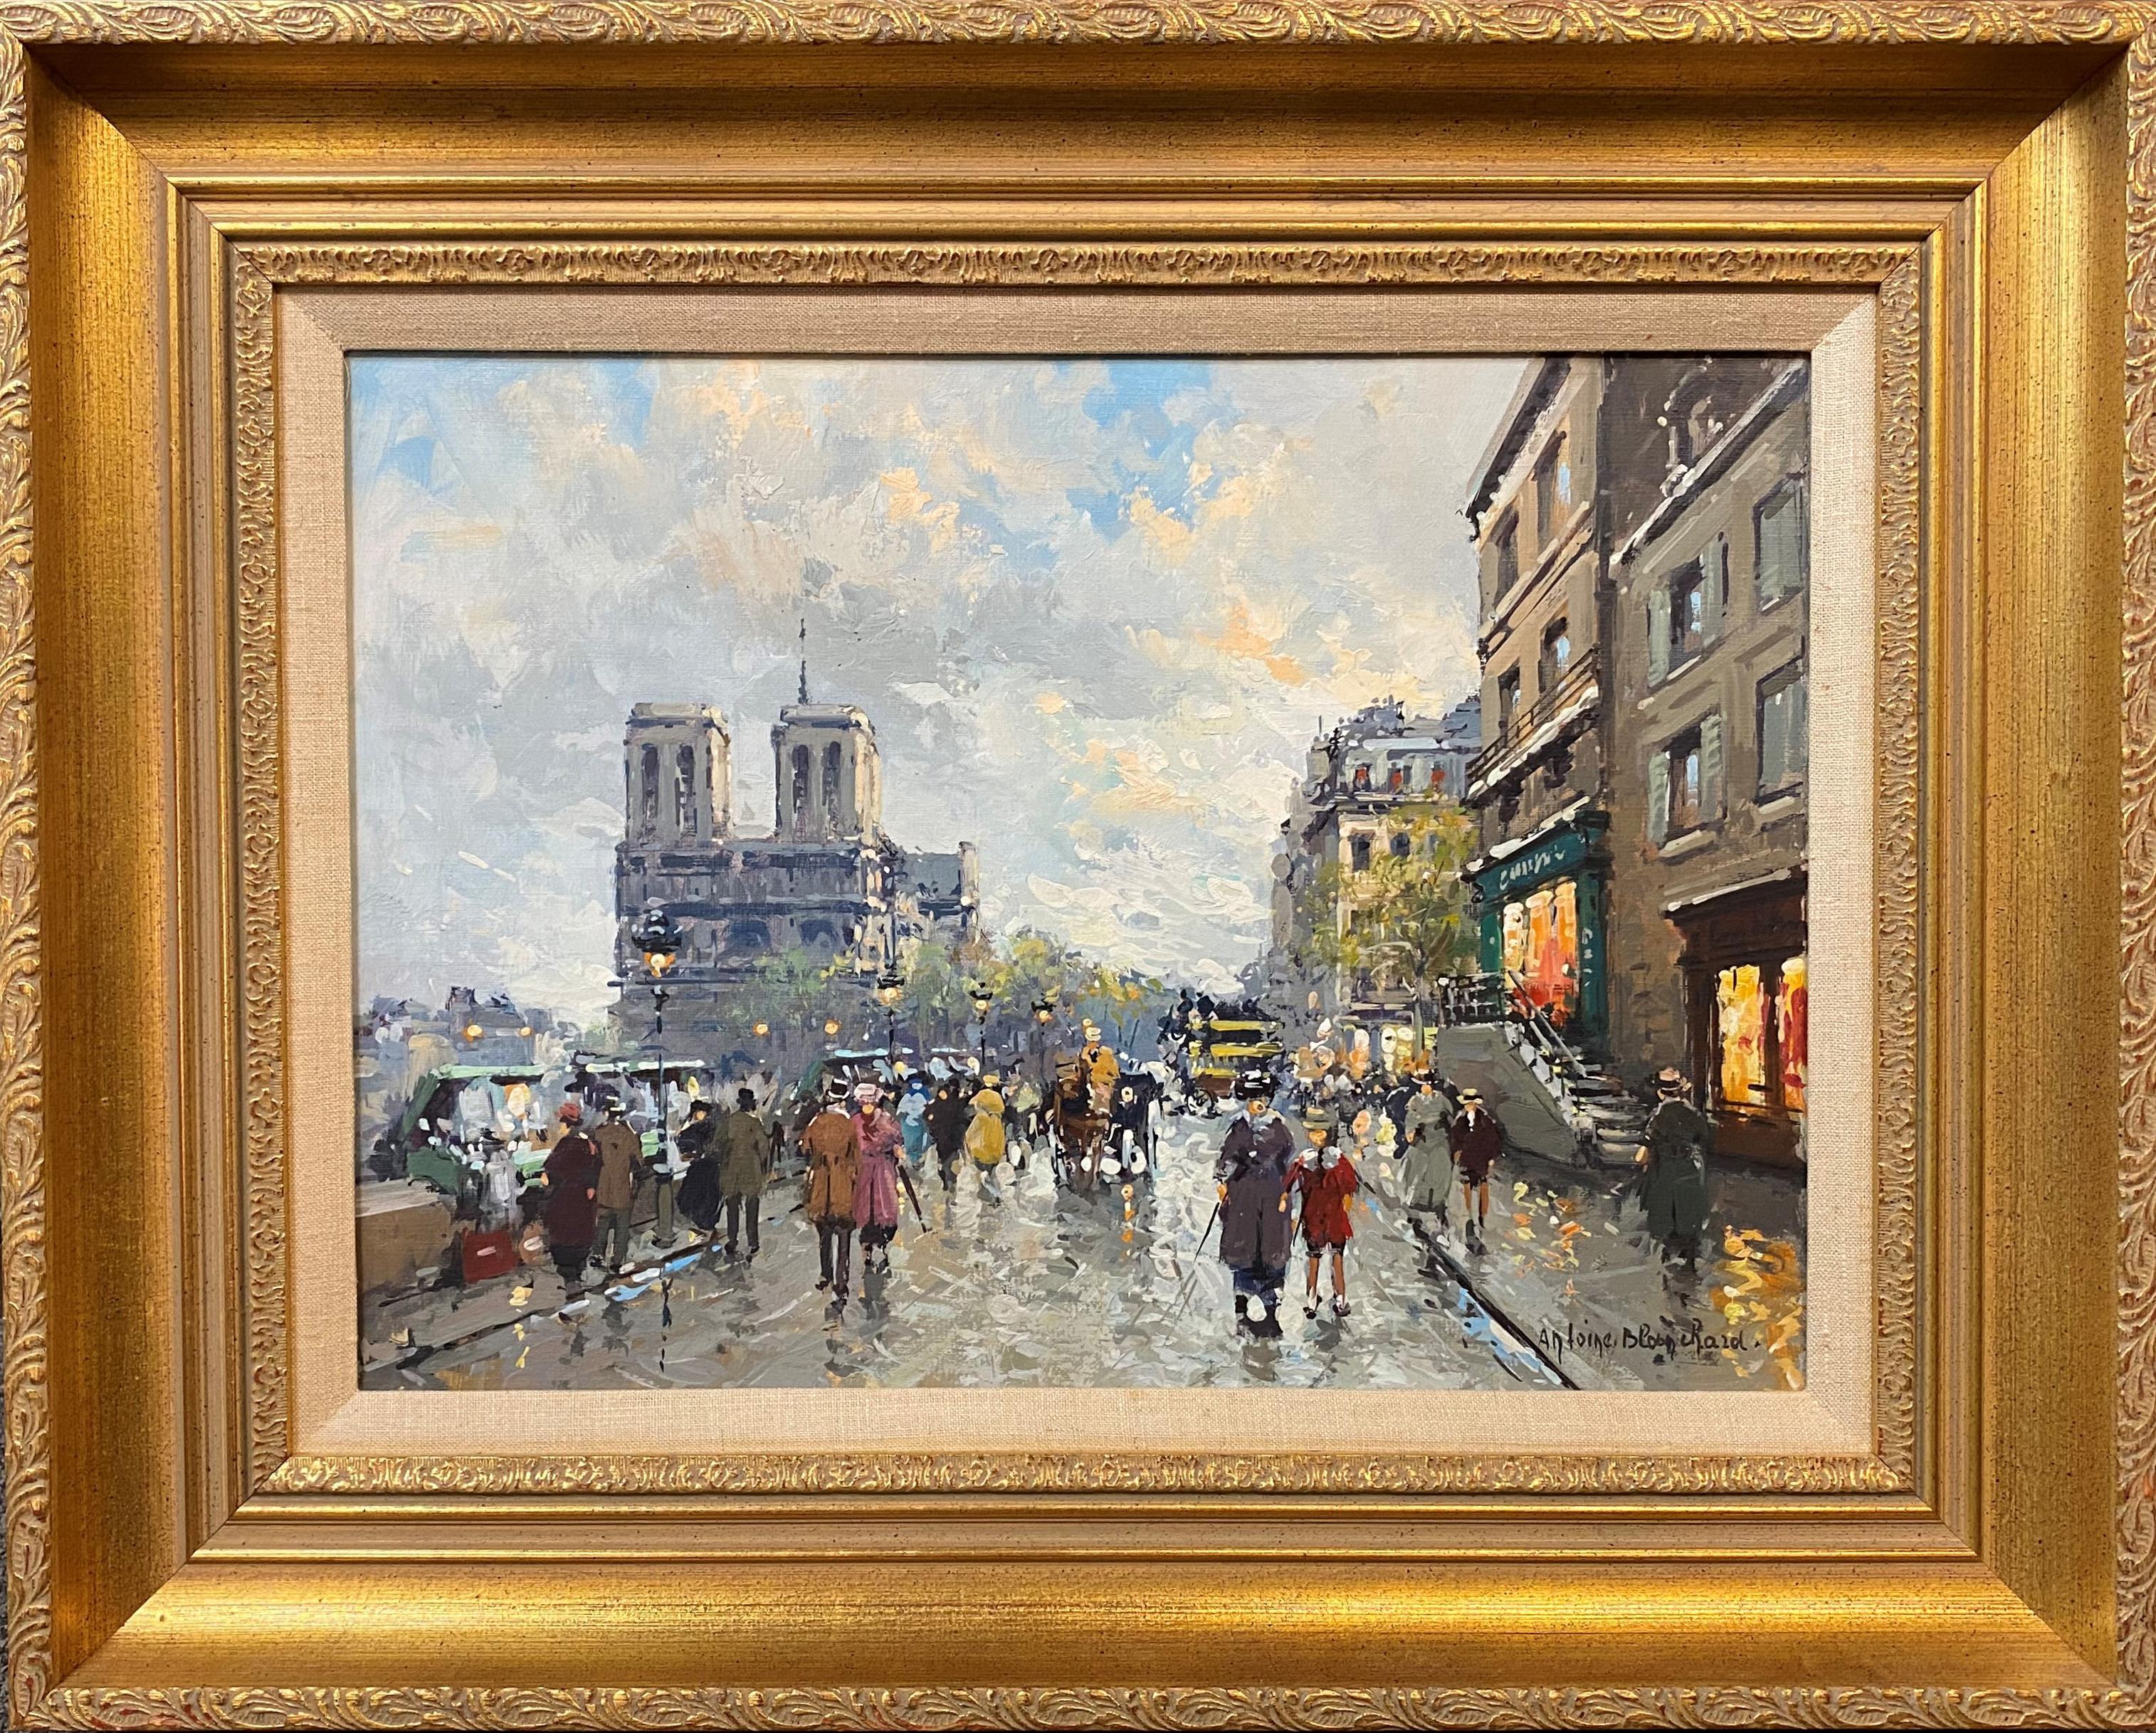 Parisian Street Scene with Notre Dame